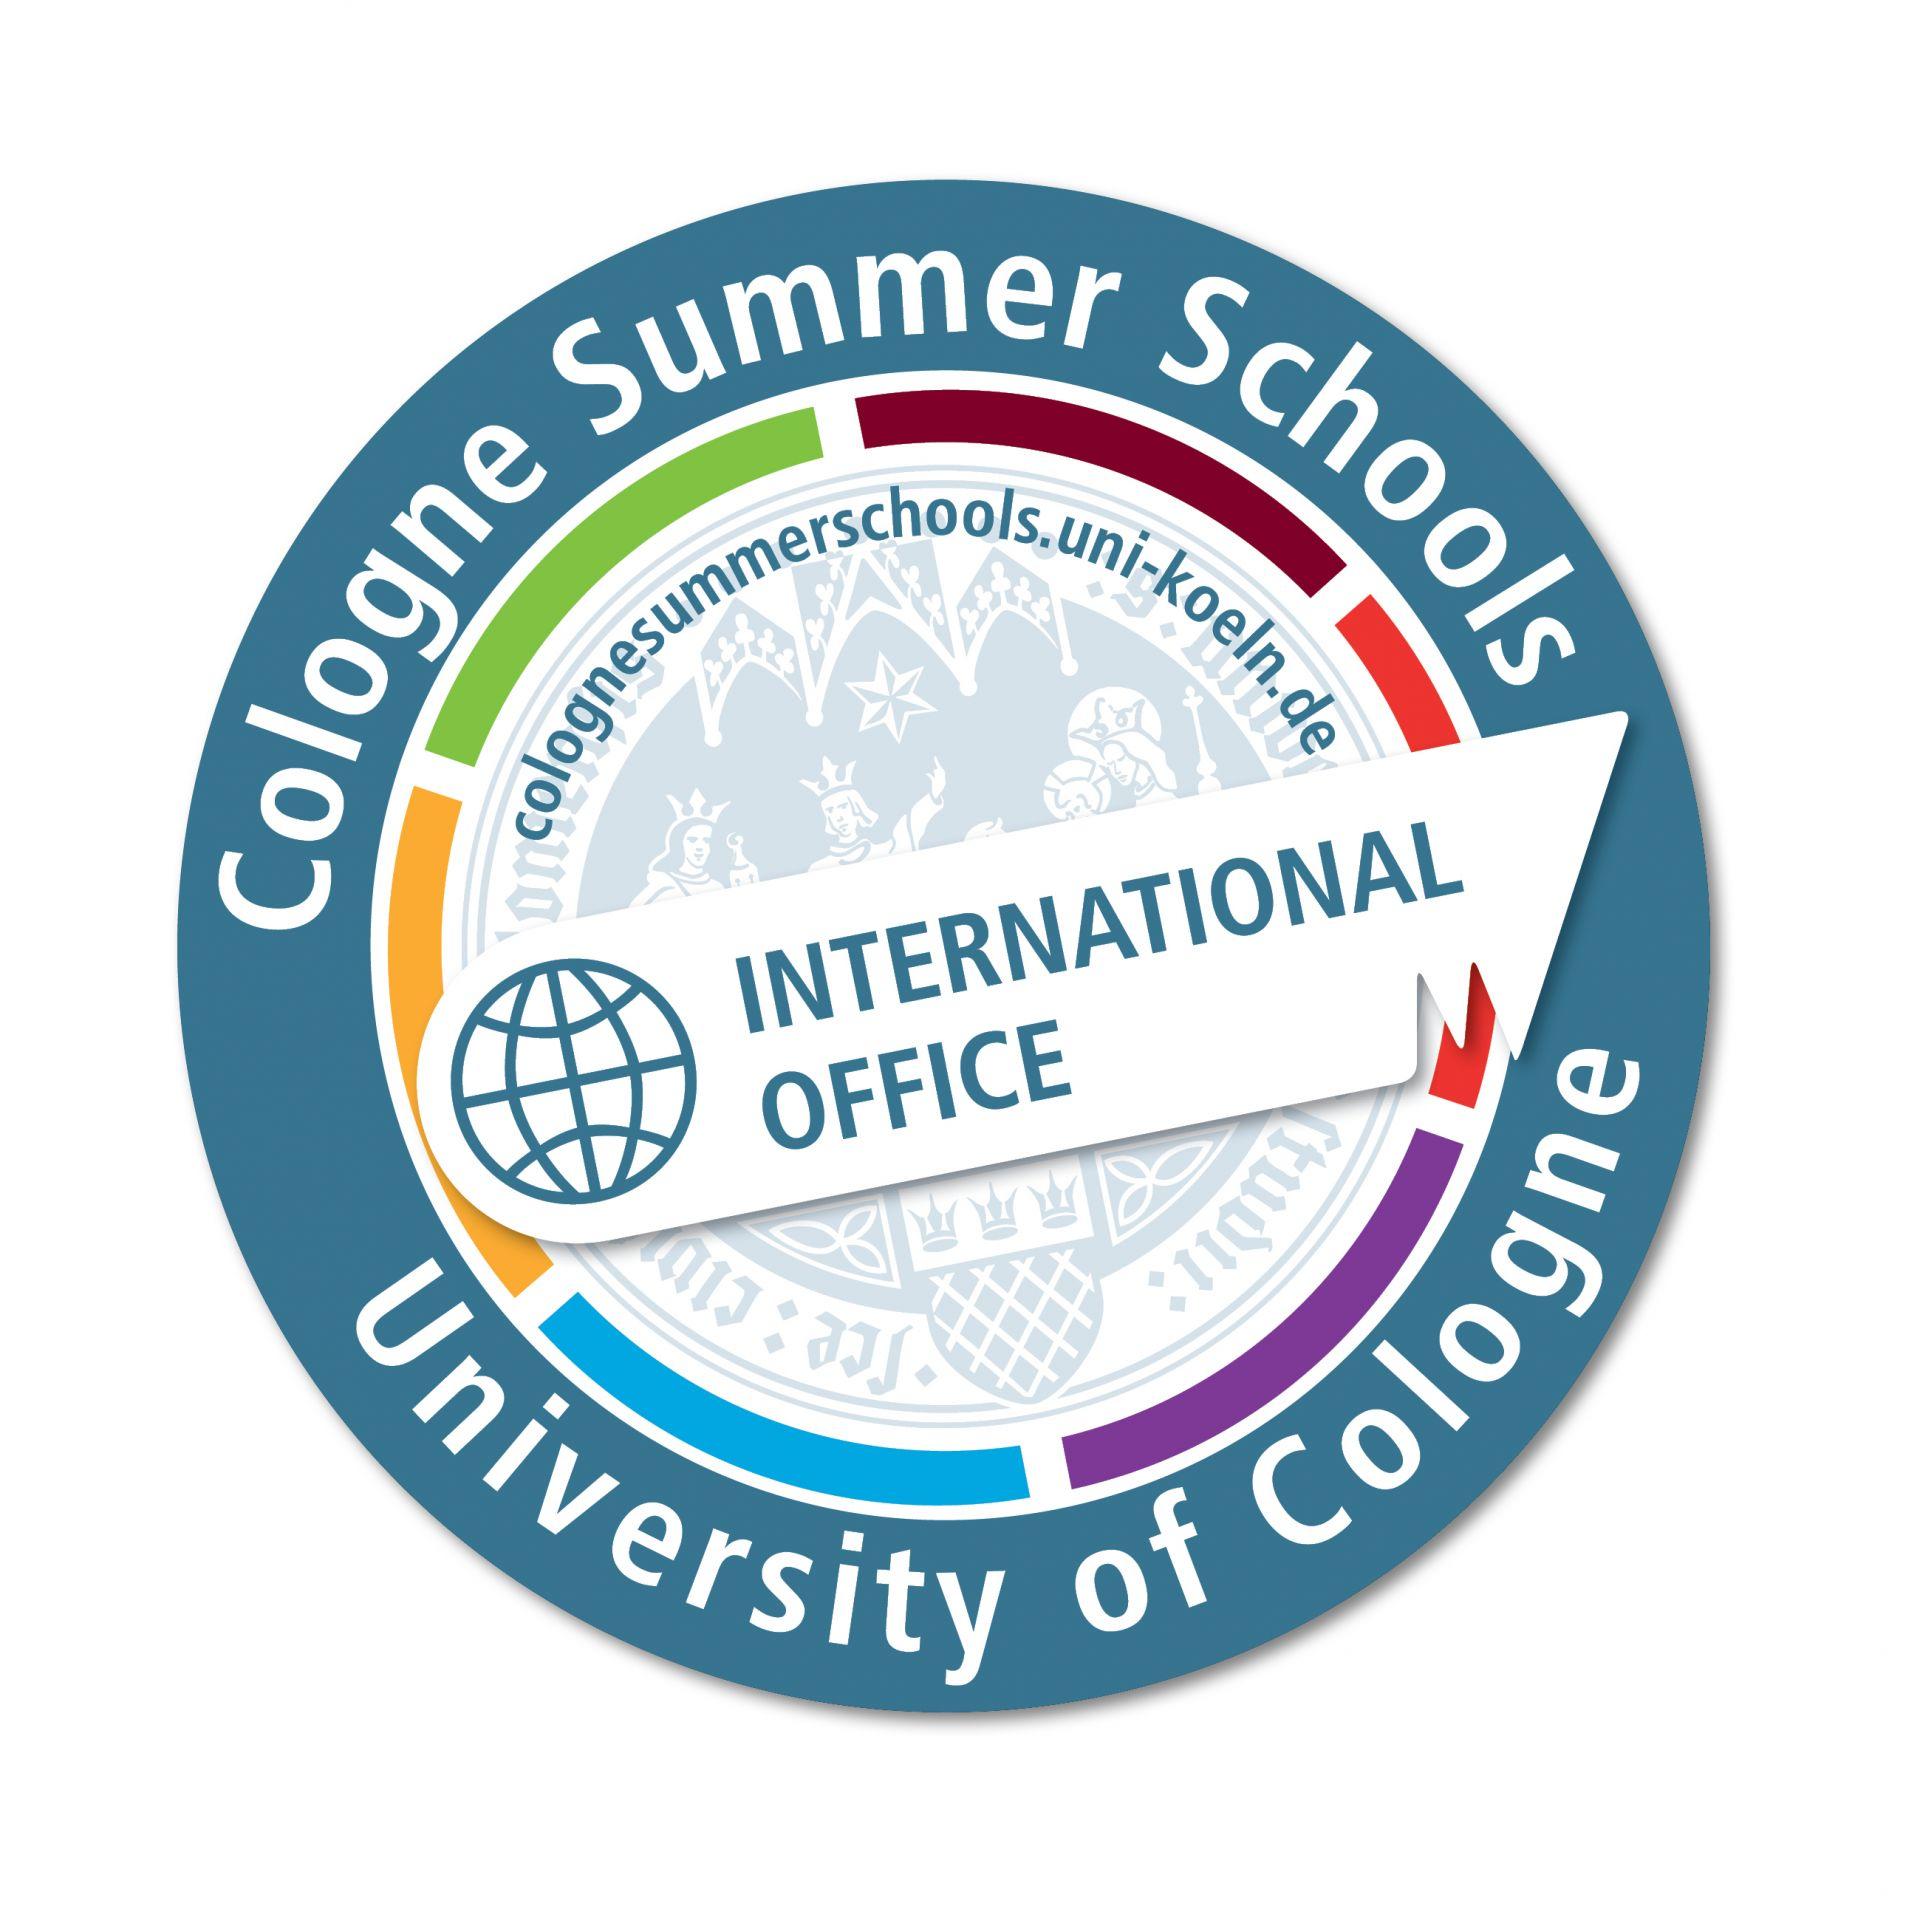 026 Philosophy Of Nursing Essay Cologne Summer School Fantastic College Full